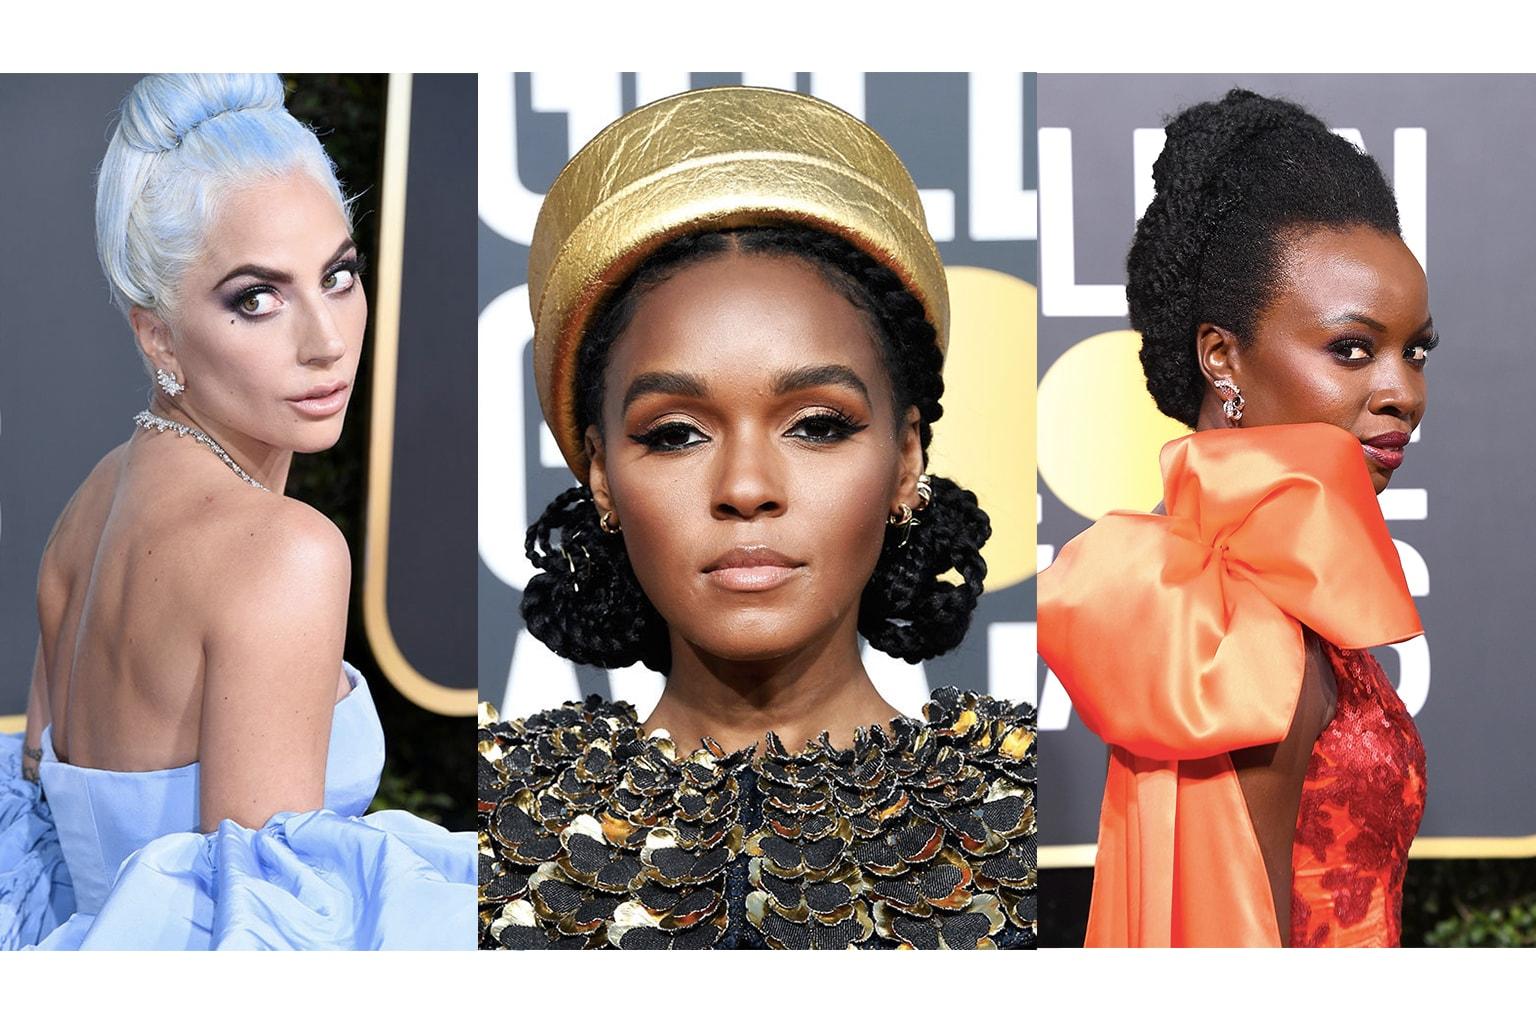 2019 Golden Globes: Best Red Carpet Makeup Looks Lady Gaga Janelle Monae Amber Heard Elle Fanning Lili Reinhart